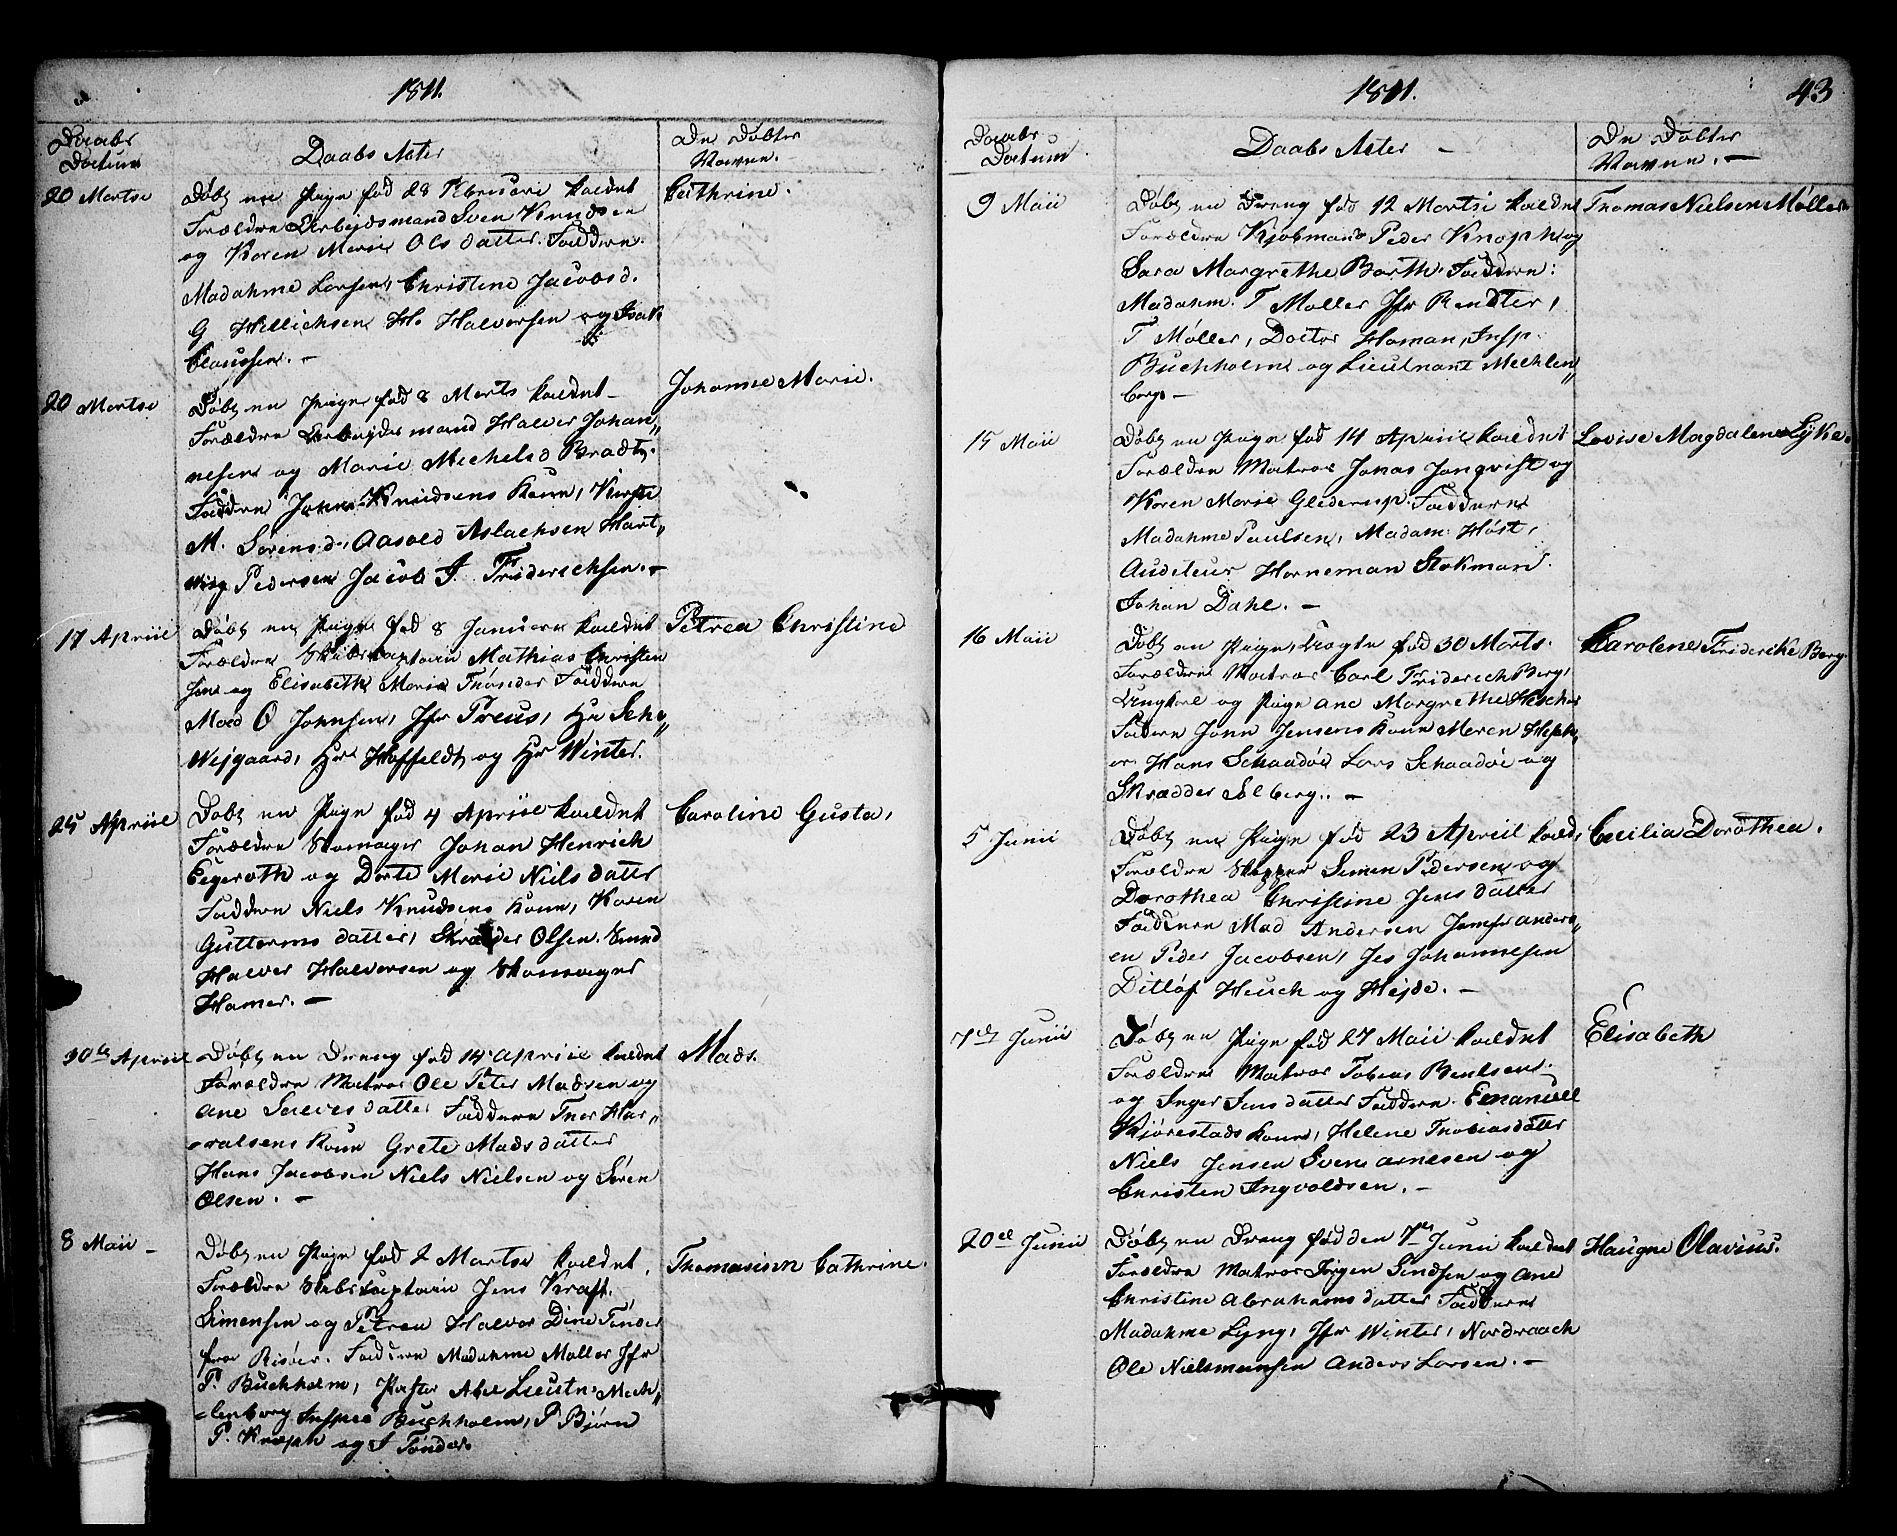 SAKO, Kragerø kirkebøker, F/Fa/L0003: Ministerialbok nr. 3, 1802-1813, s. 43